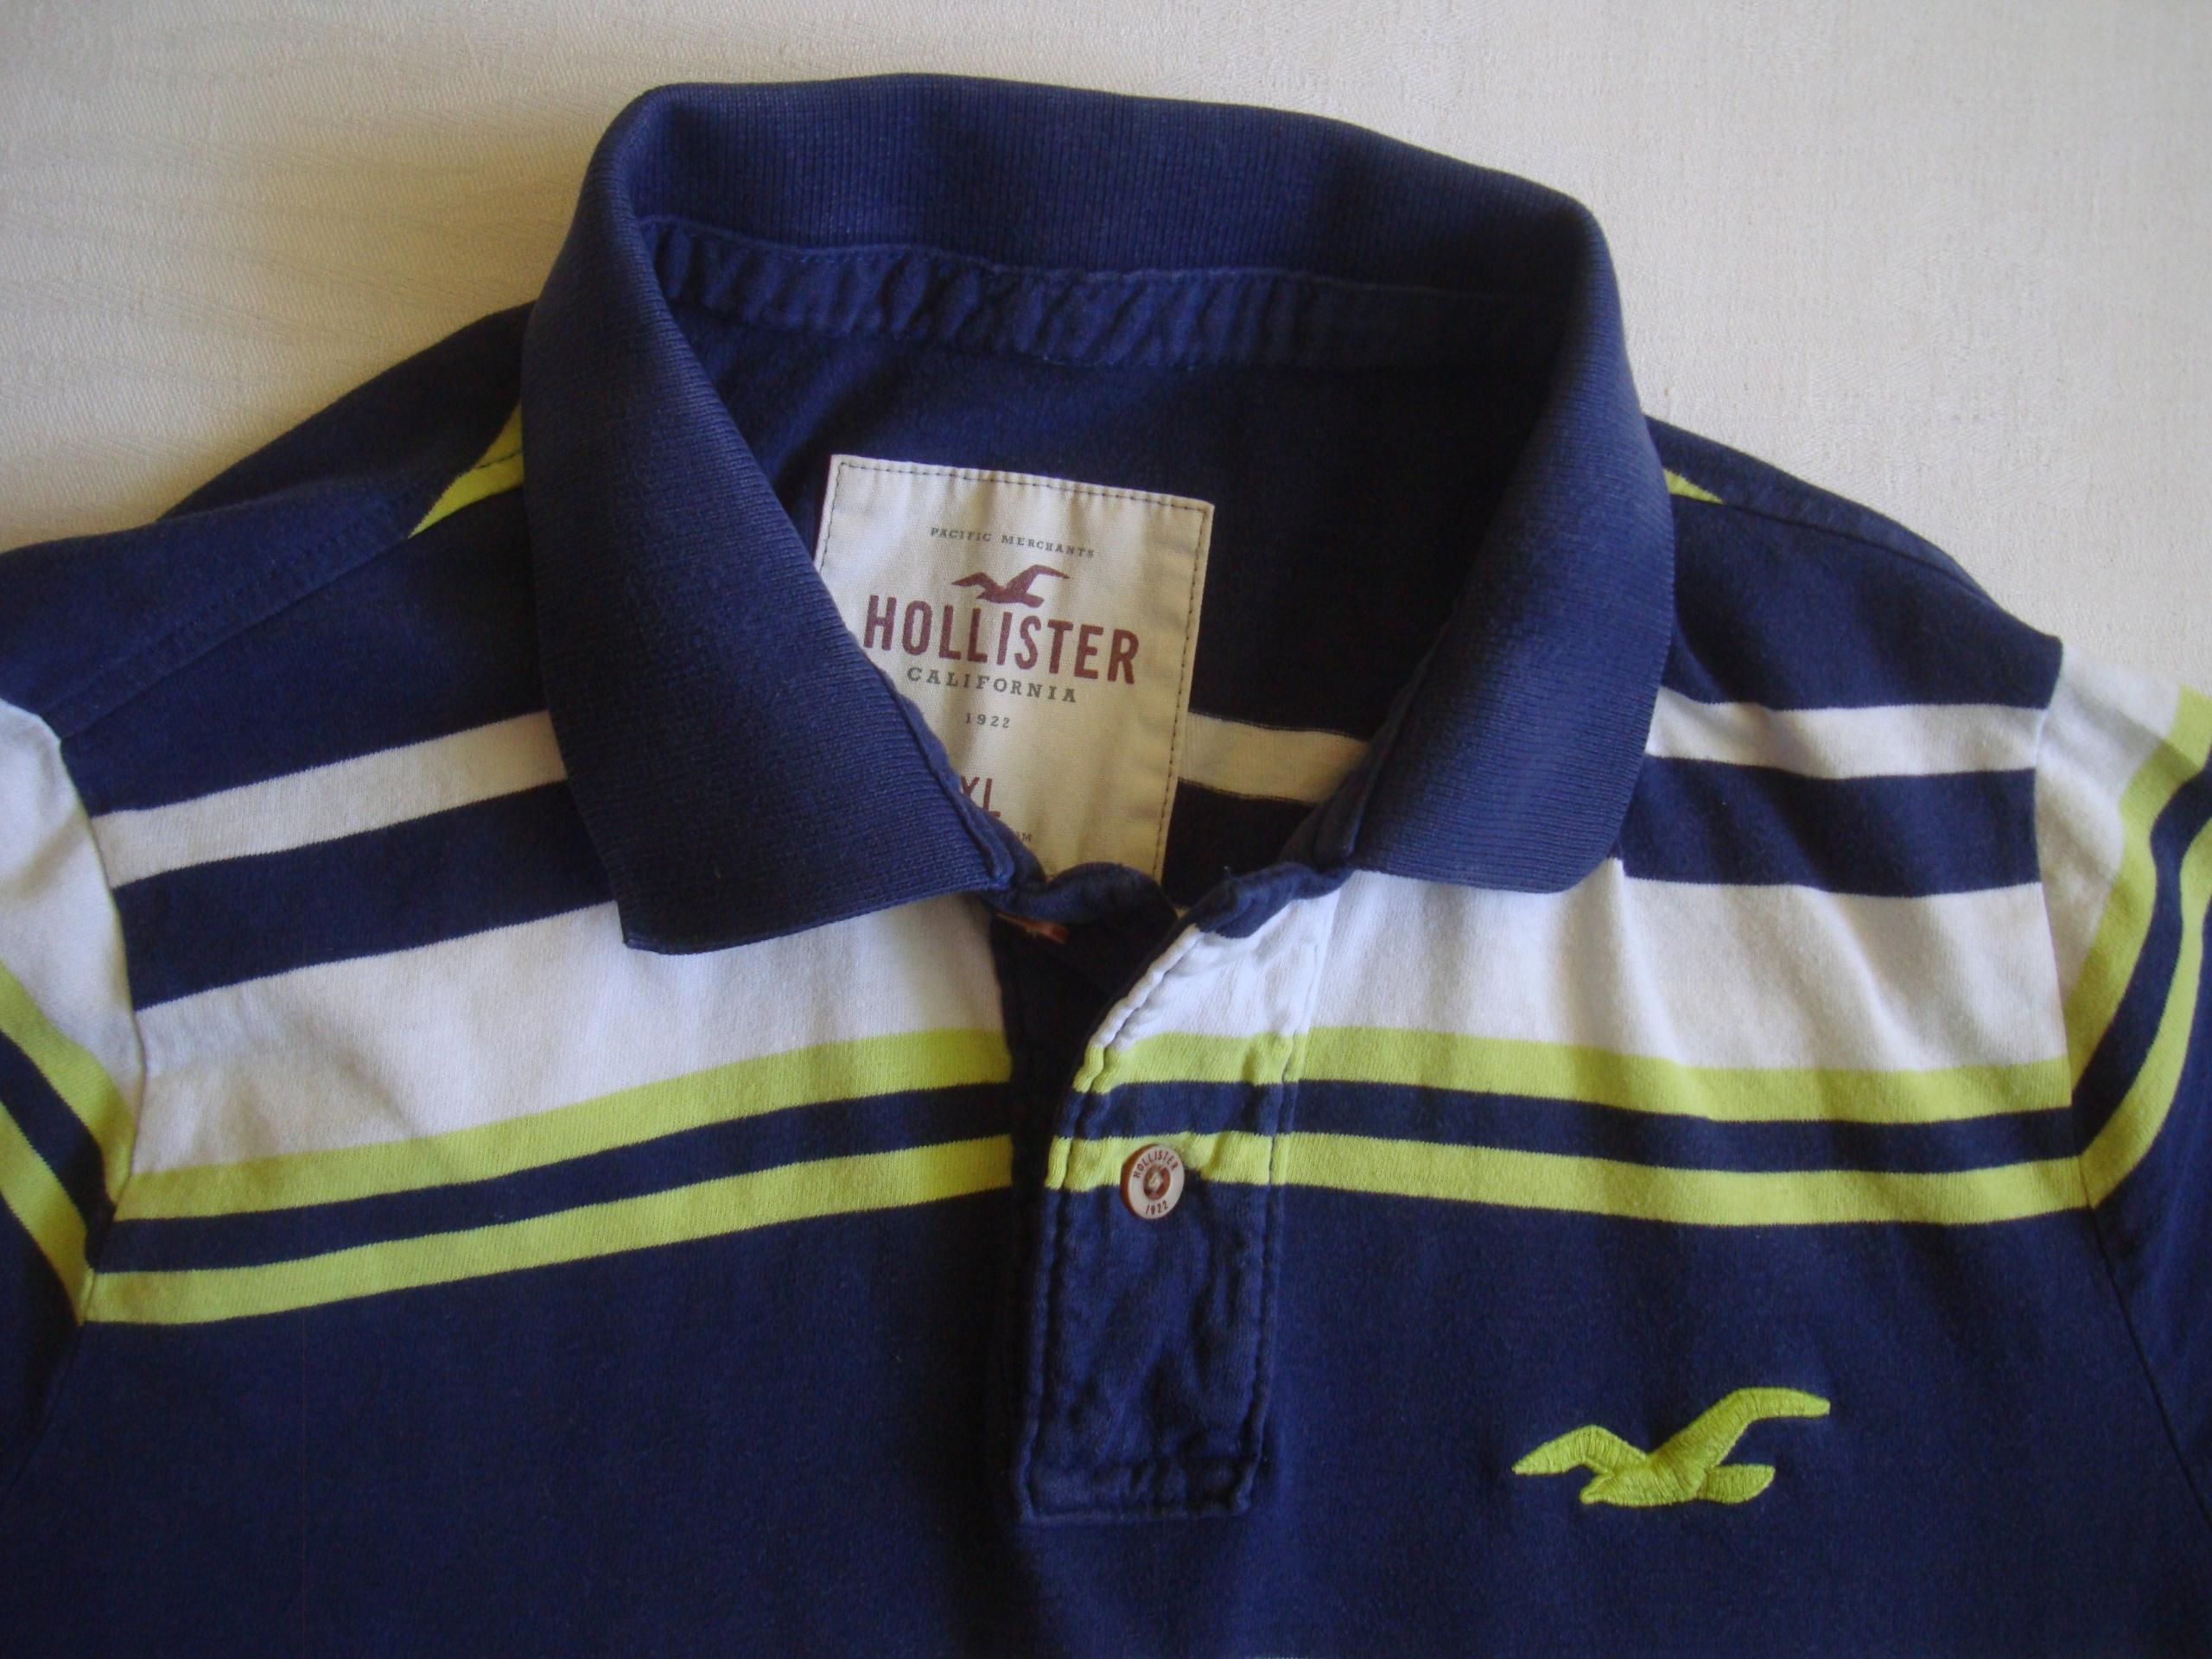 Hollister koszulka polo rozmiar (XL)